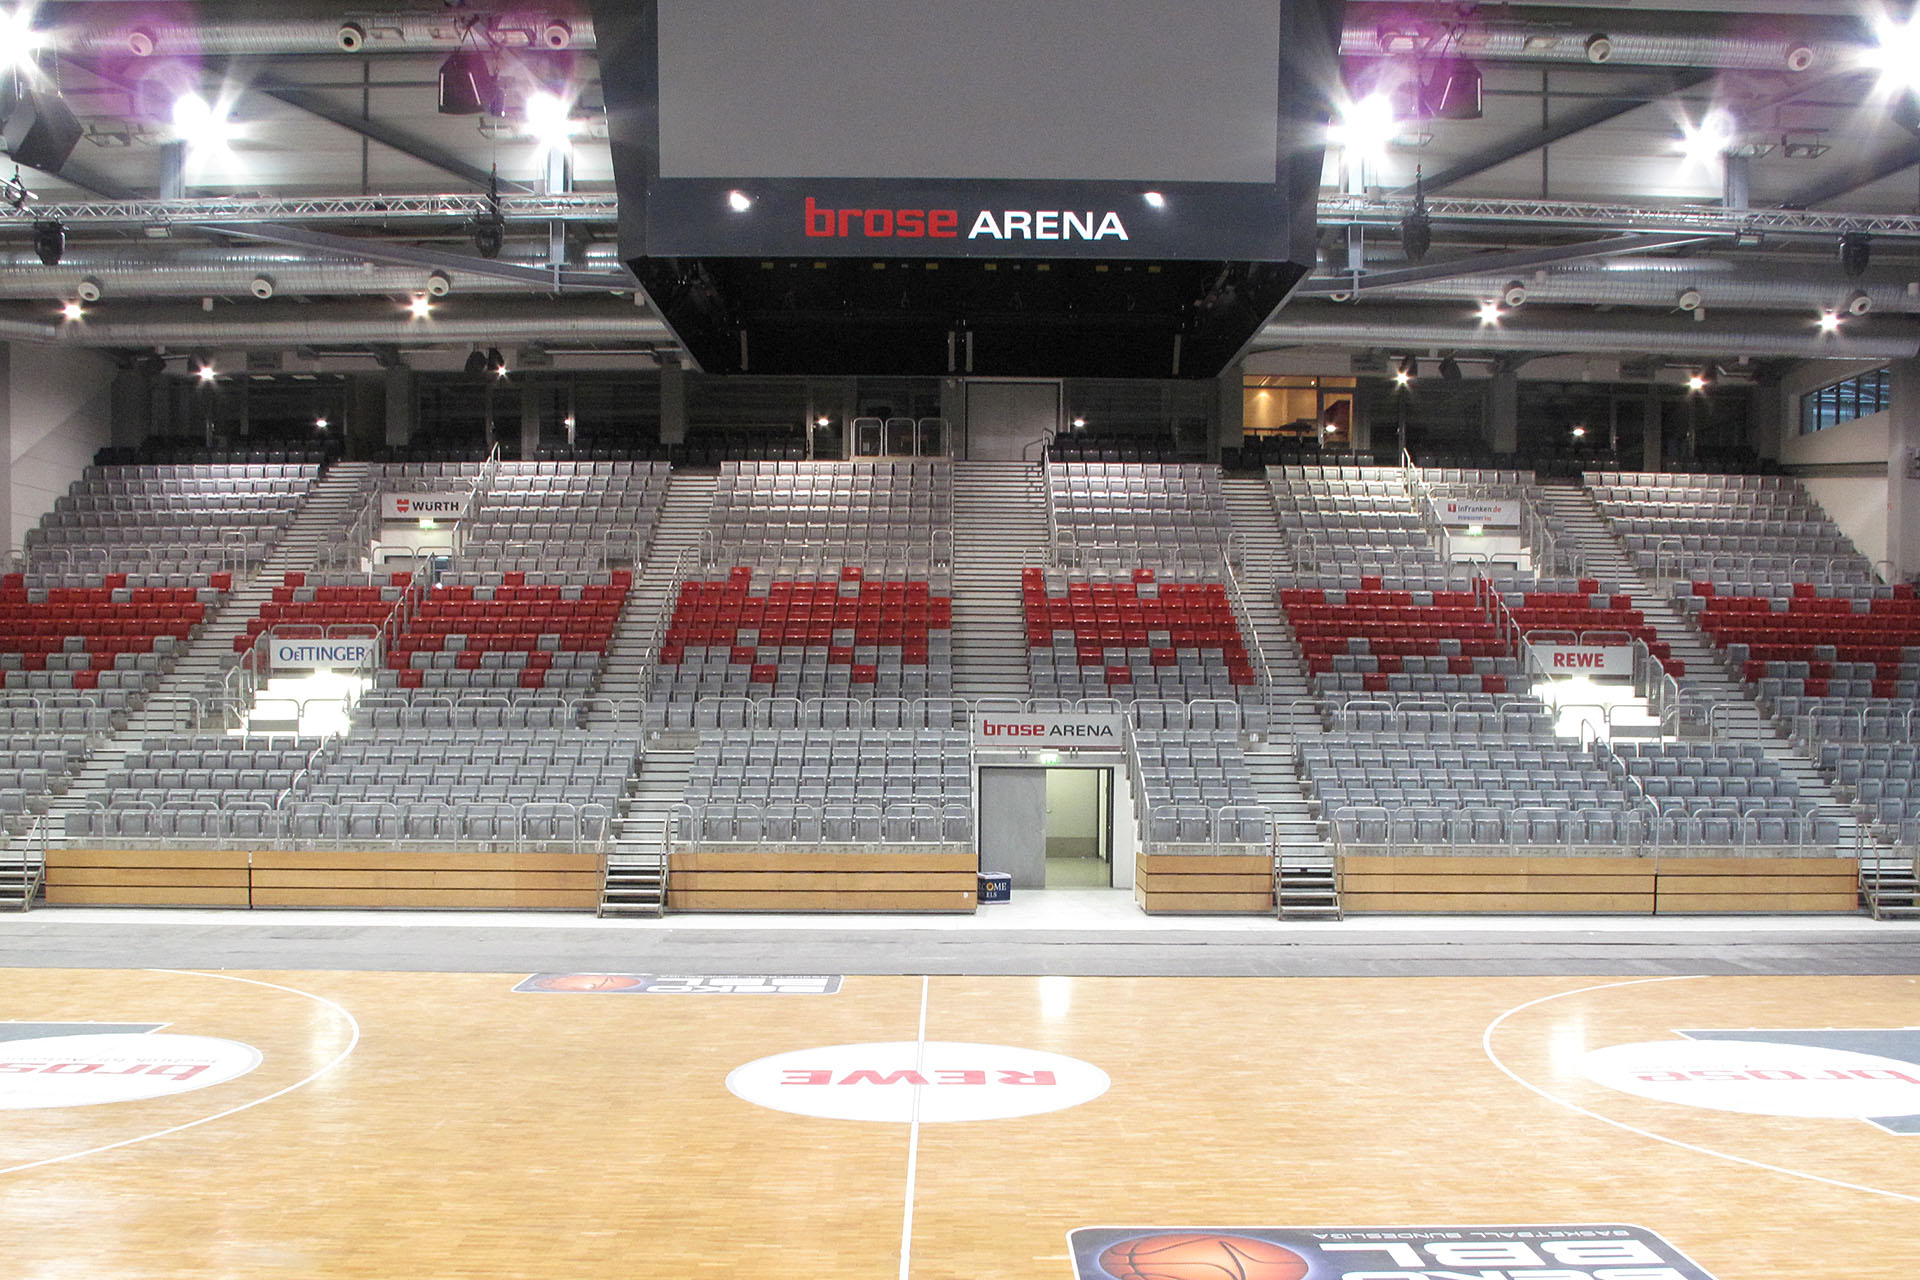 de_bamberg_brose-arena_689_web